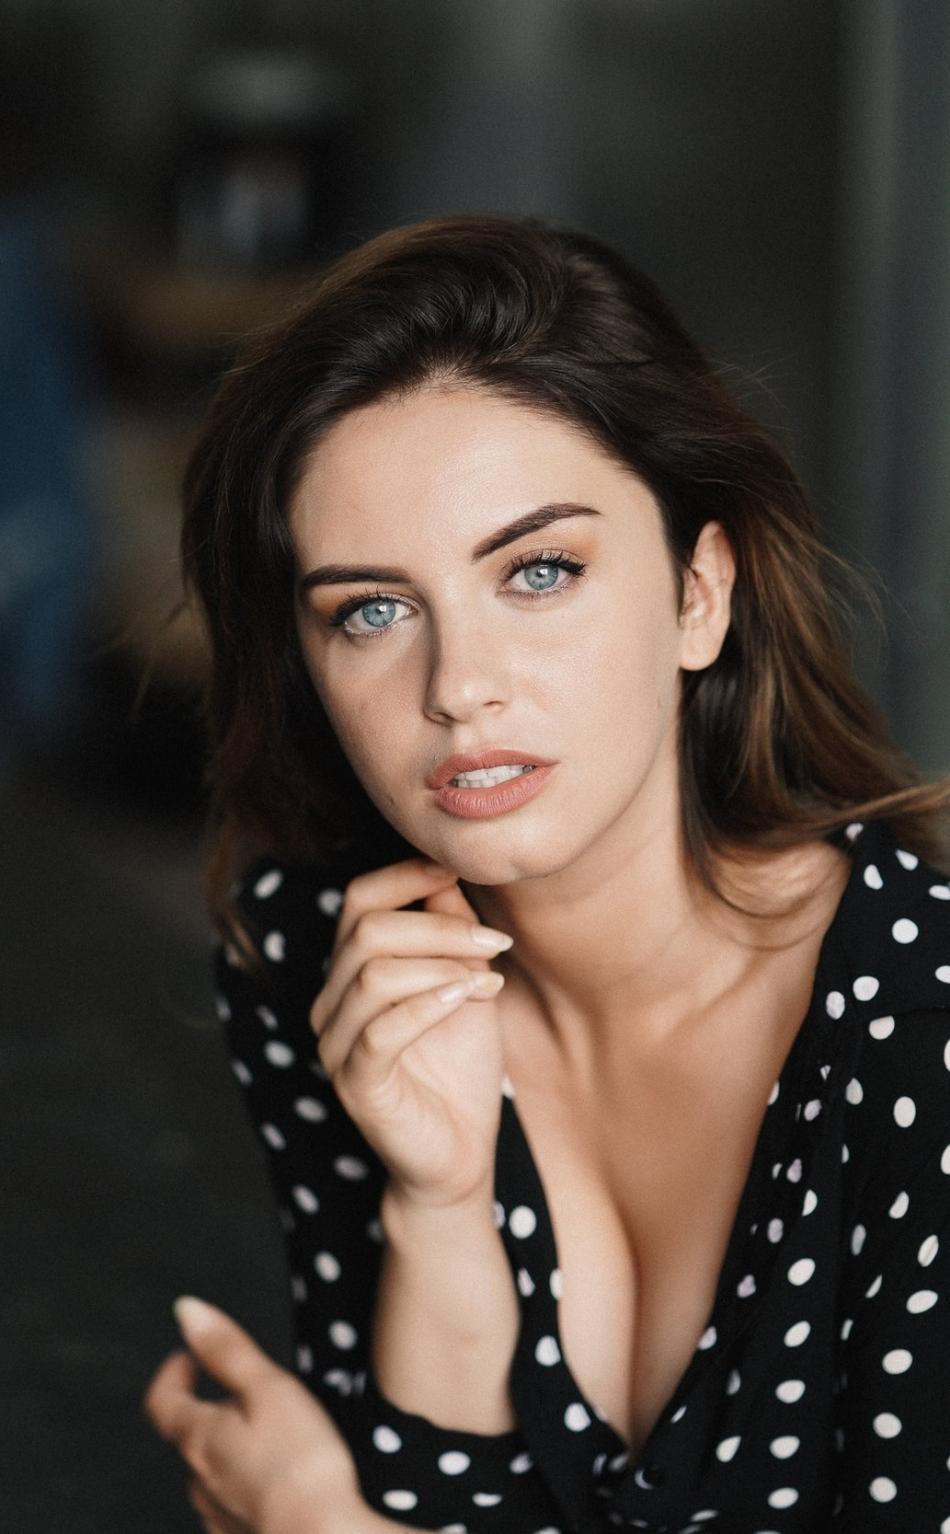 blue Brunette eyes with